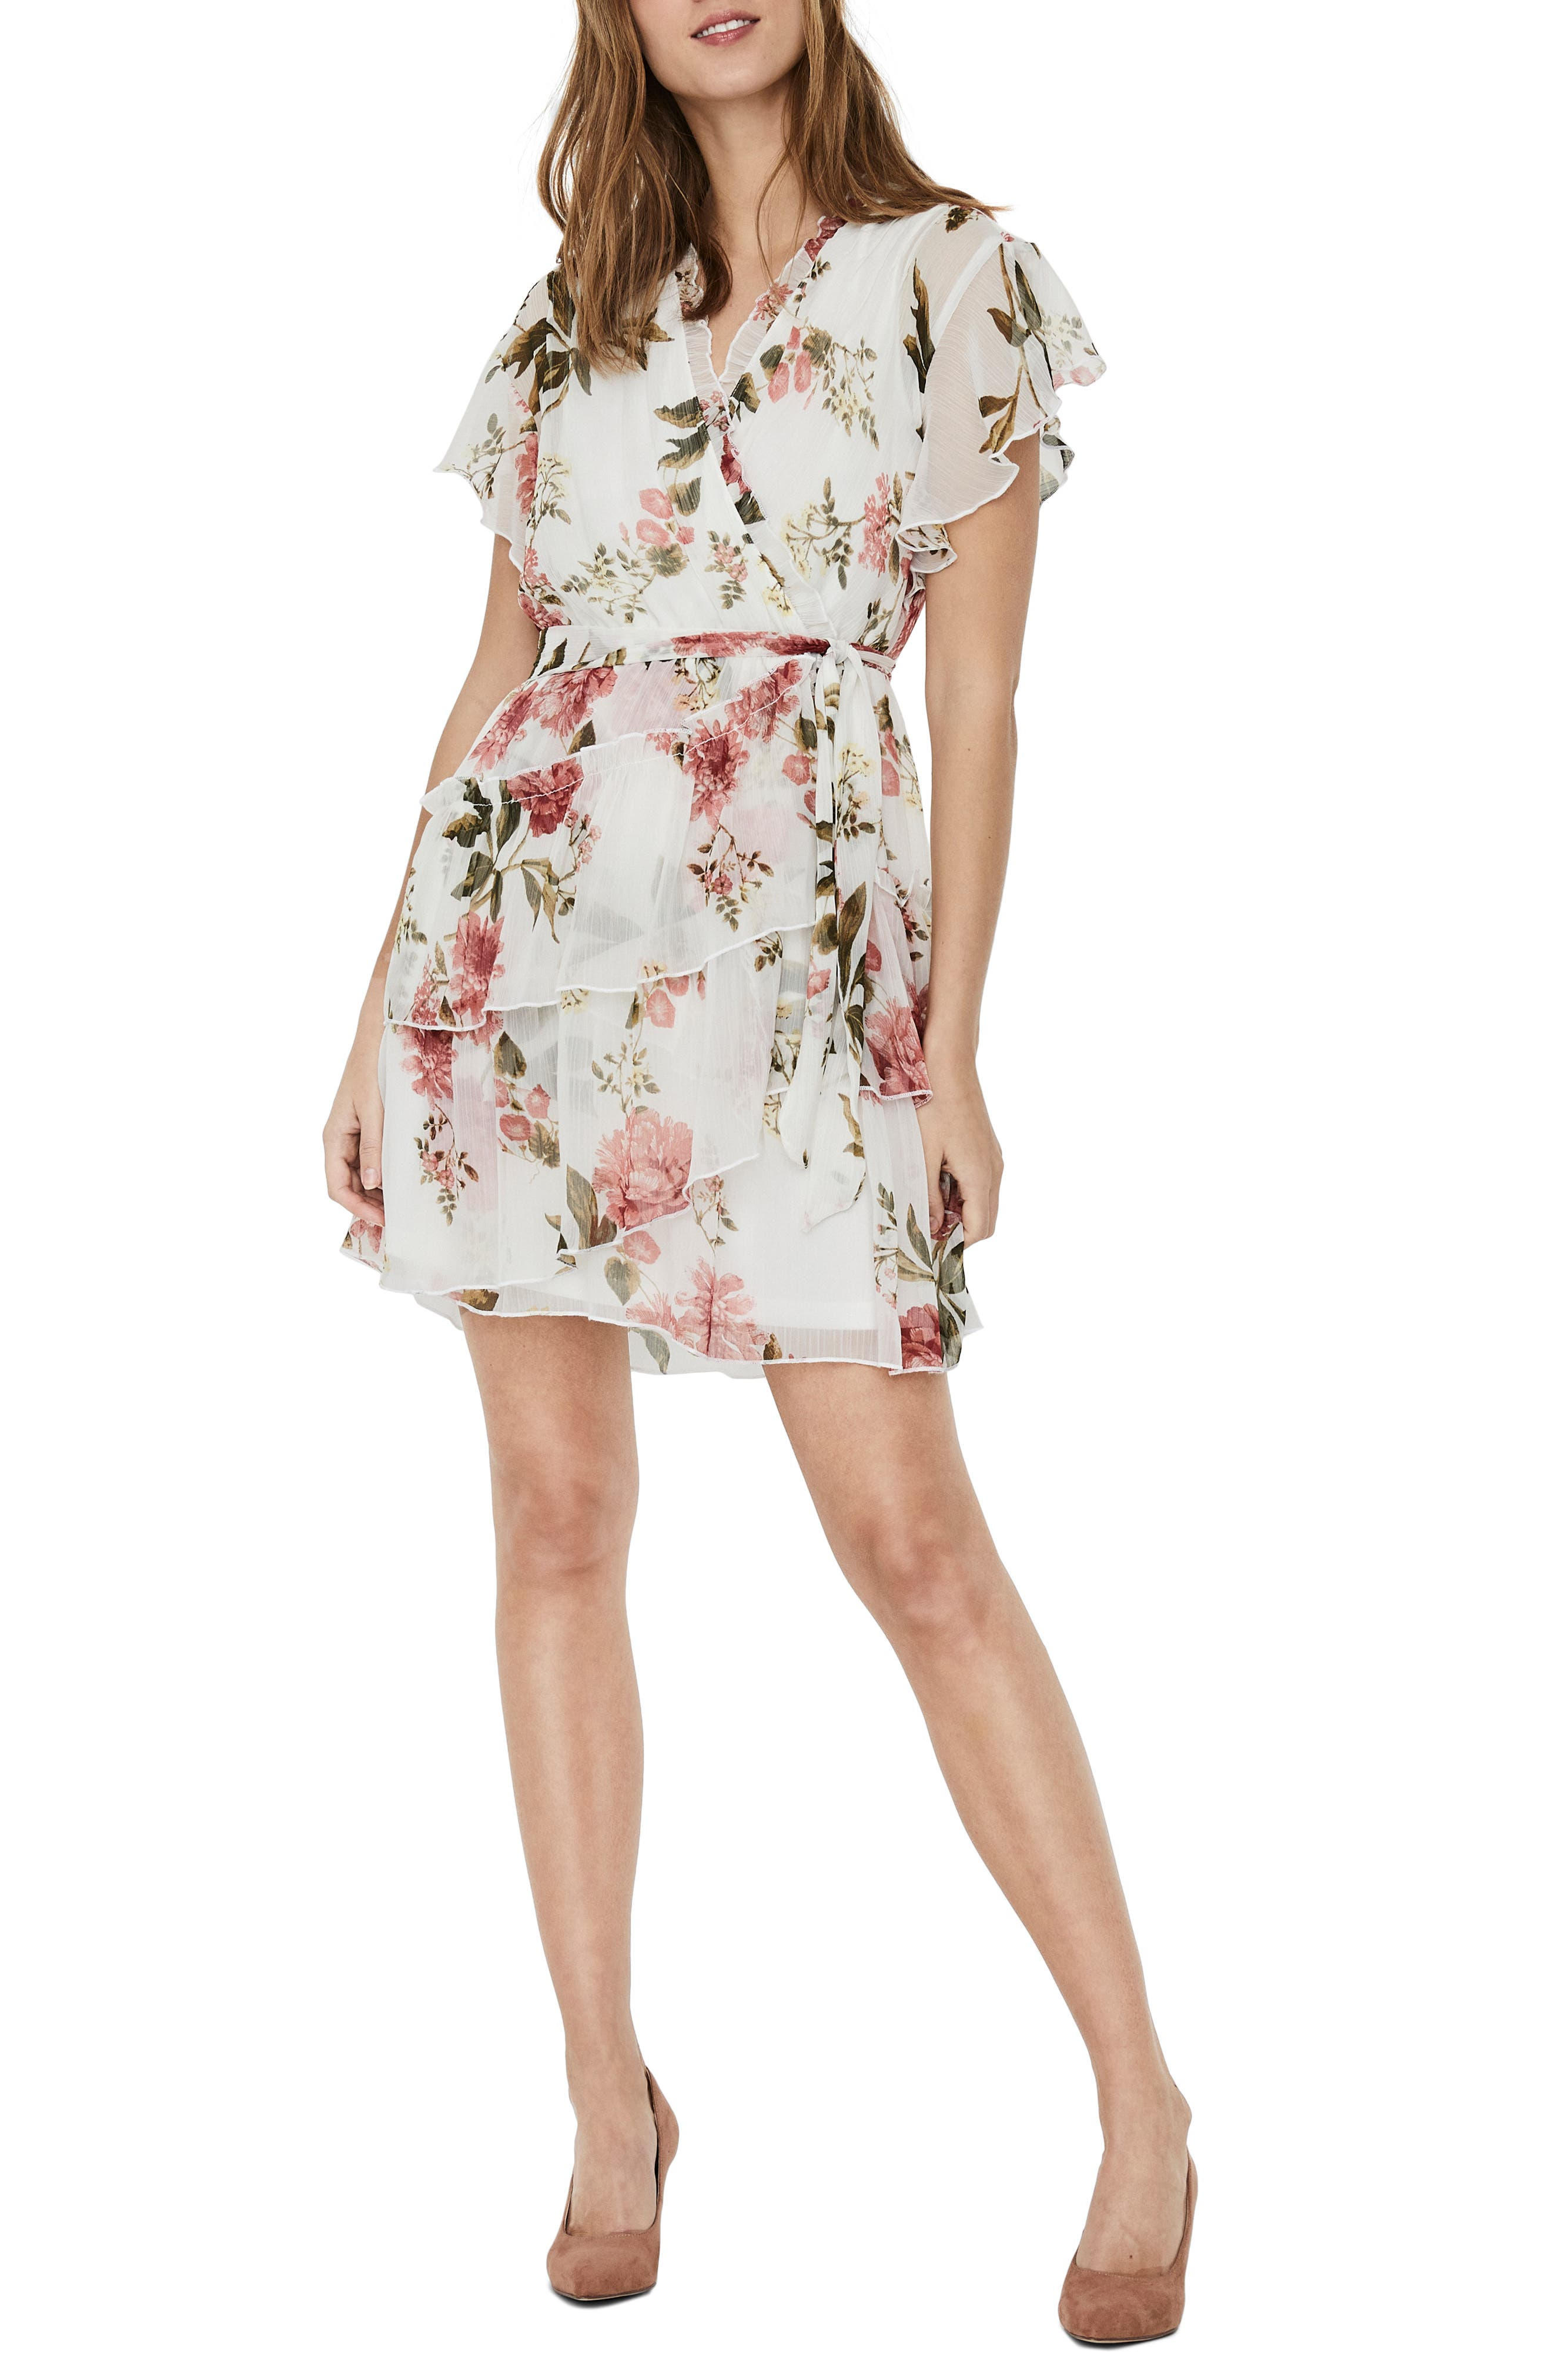 Image of VERO MODA Lucca Short Sleeve Floral Print Dress